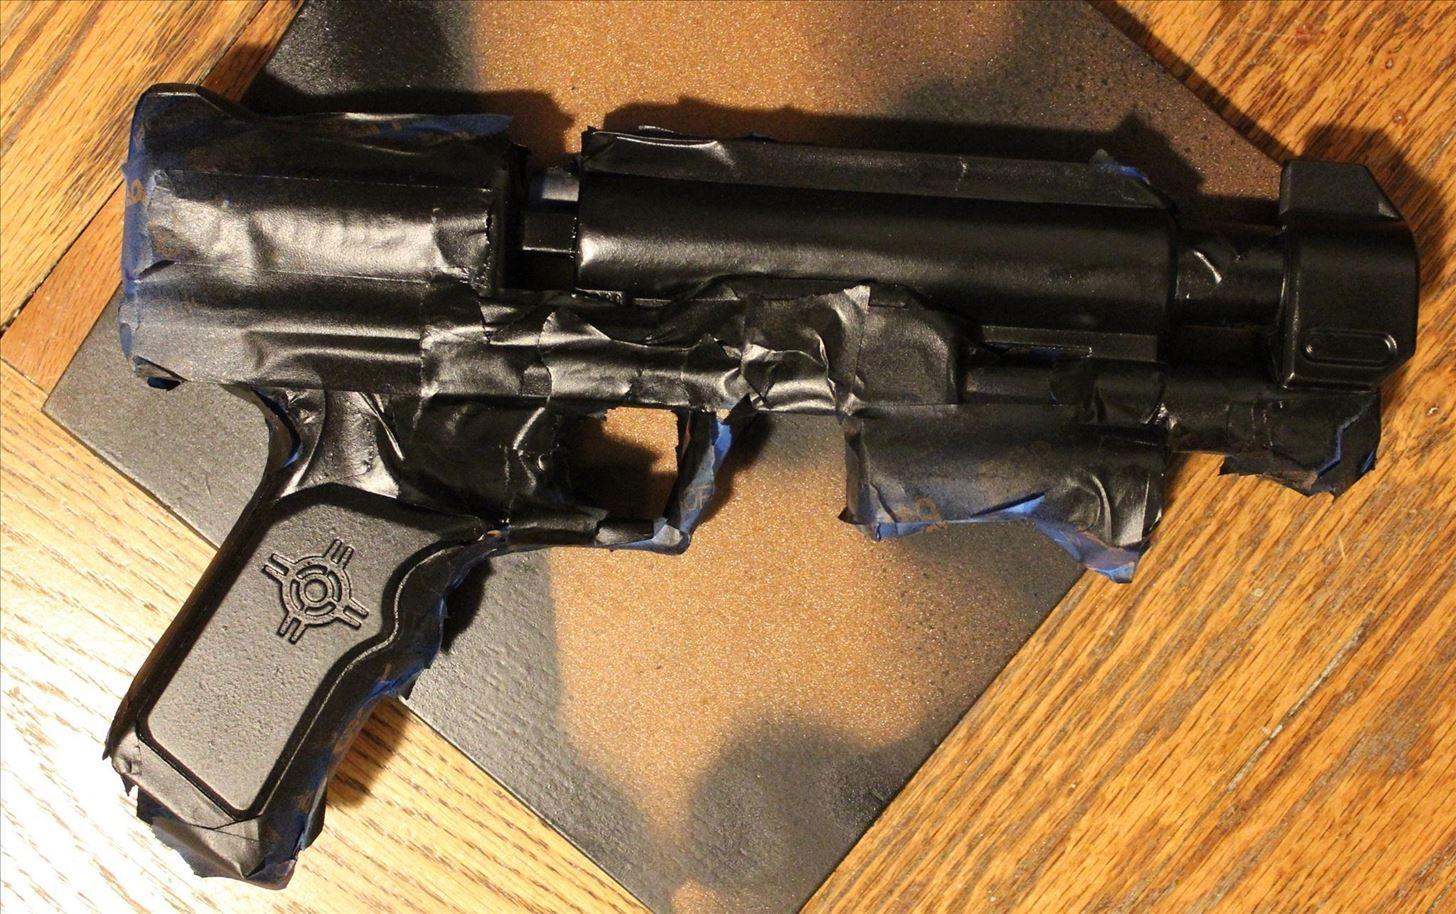 Paint Spray Guns For Sale Uk